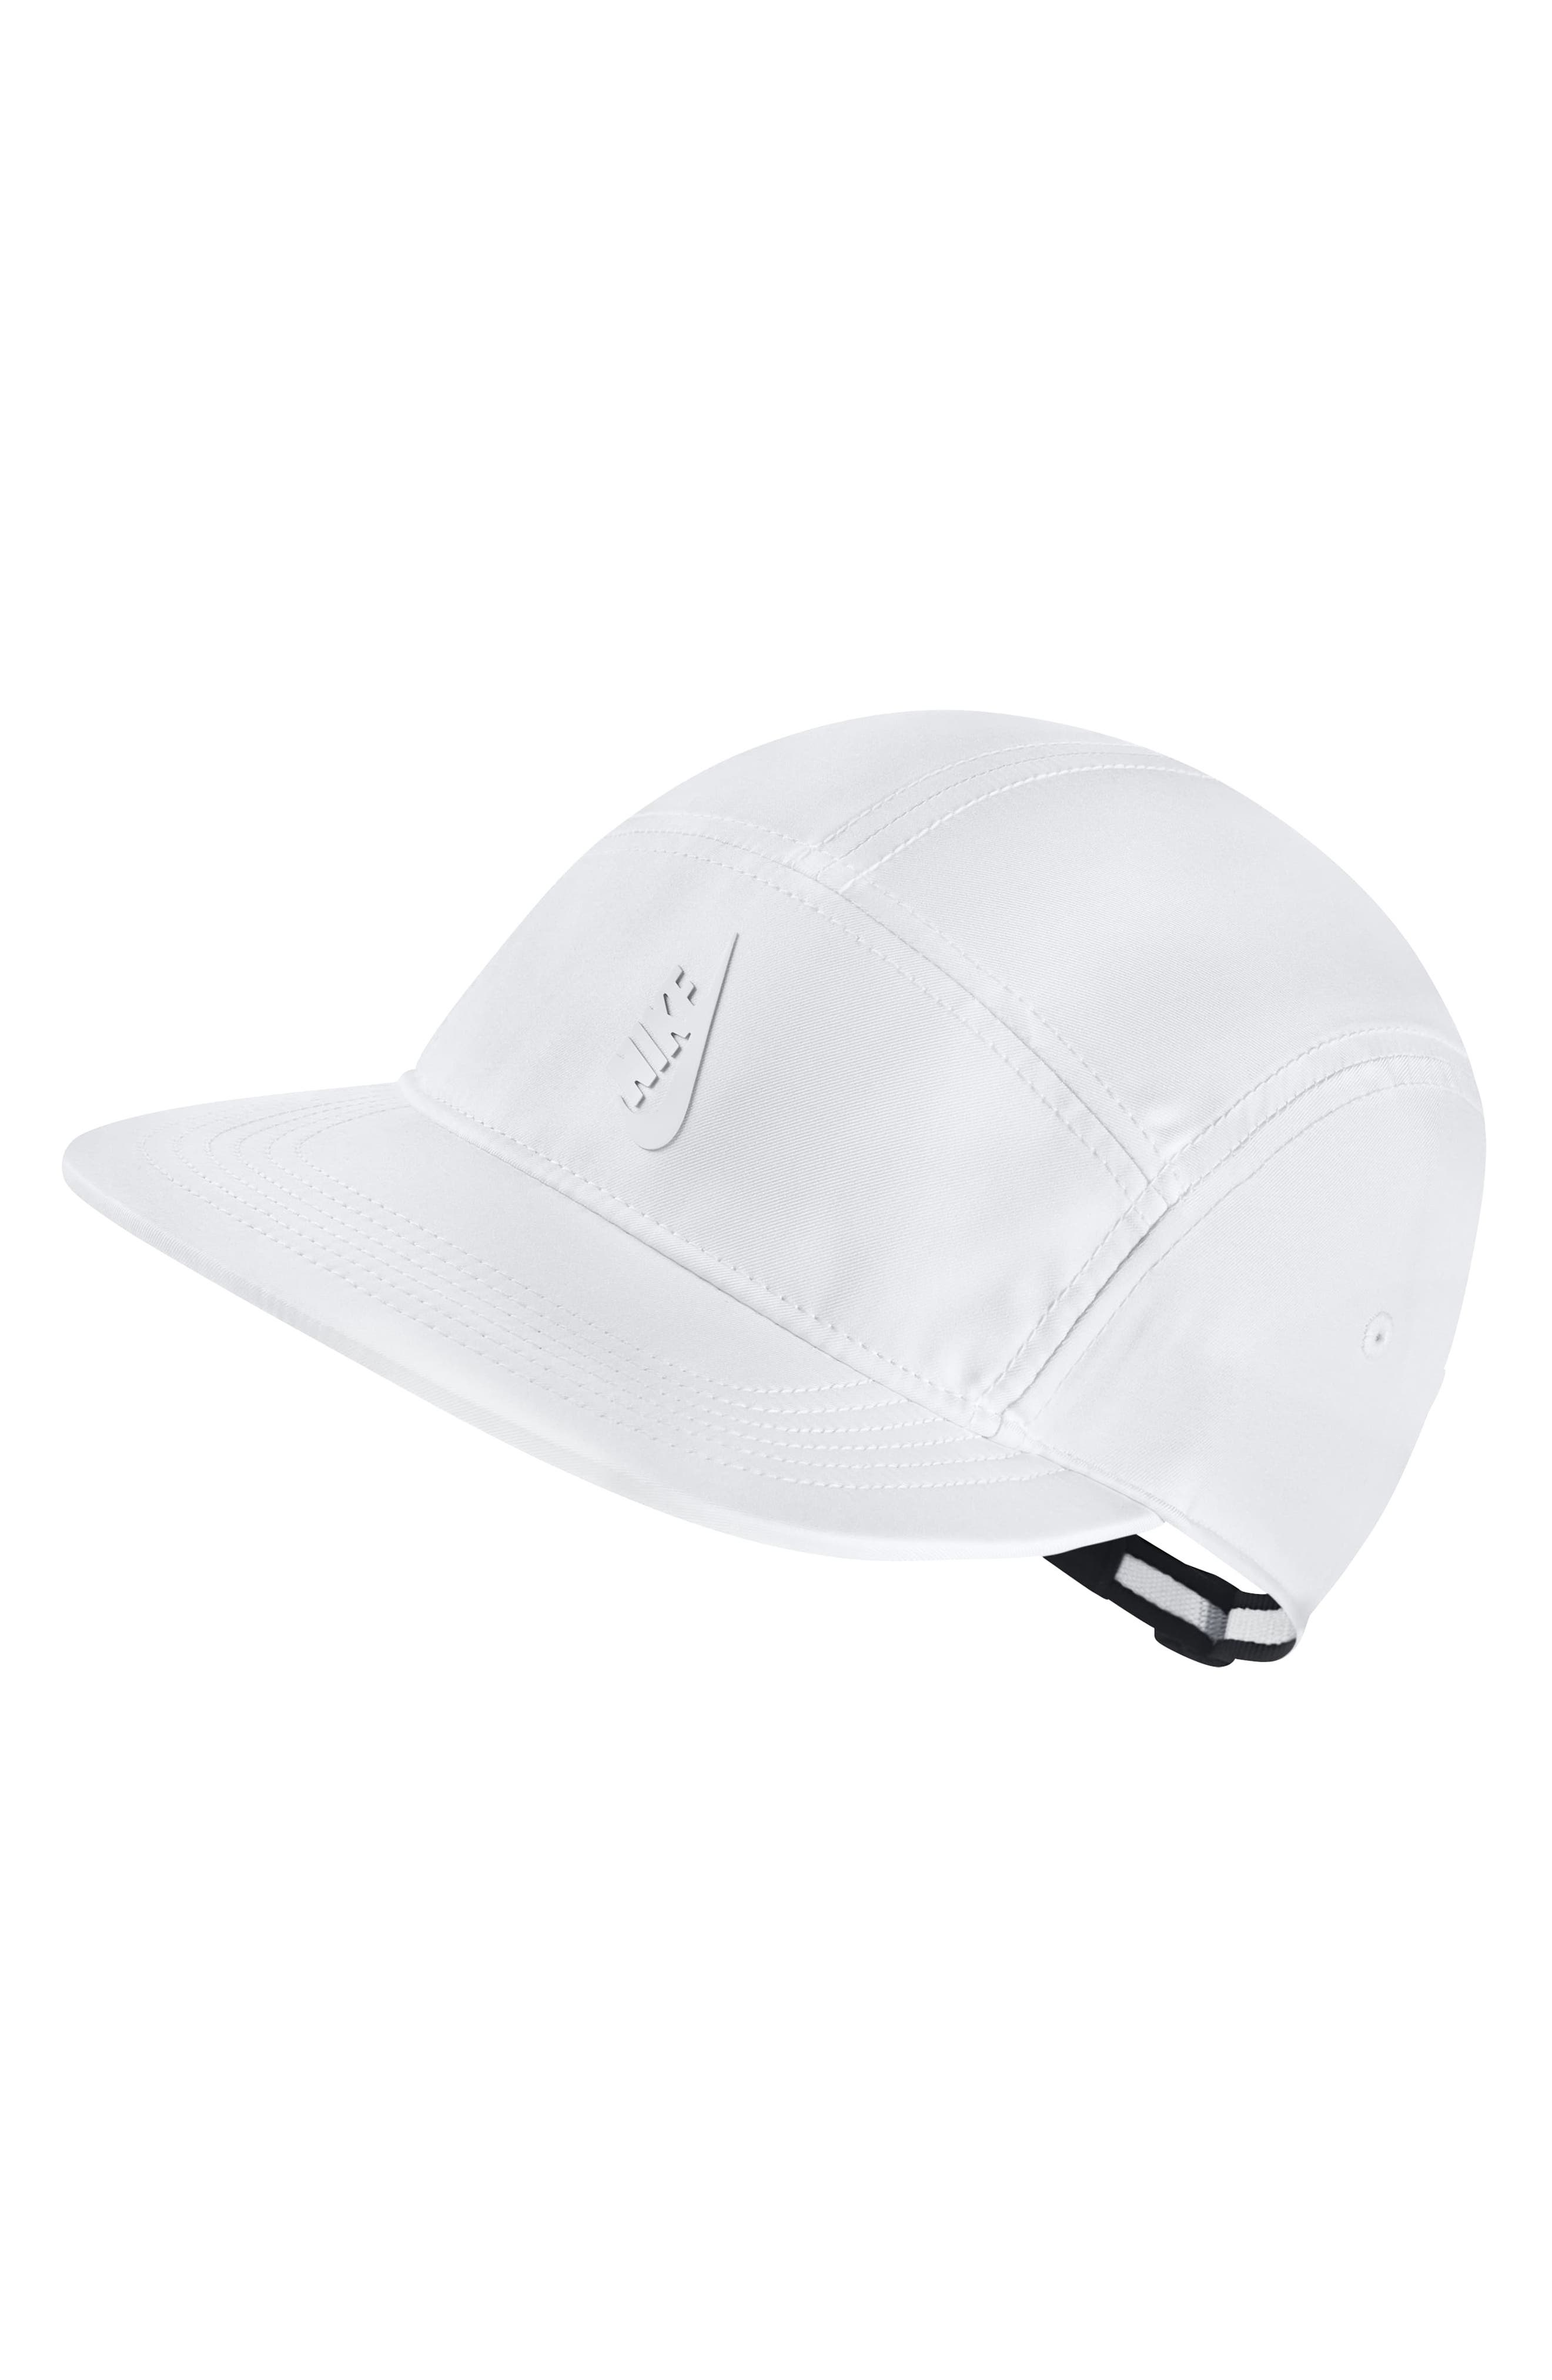 Sportswear NikeLab Baseball Cap,                             Main thumbnail 1, color,                             White/ Black/ White/ White